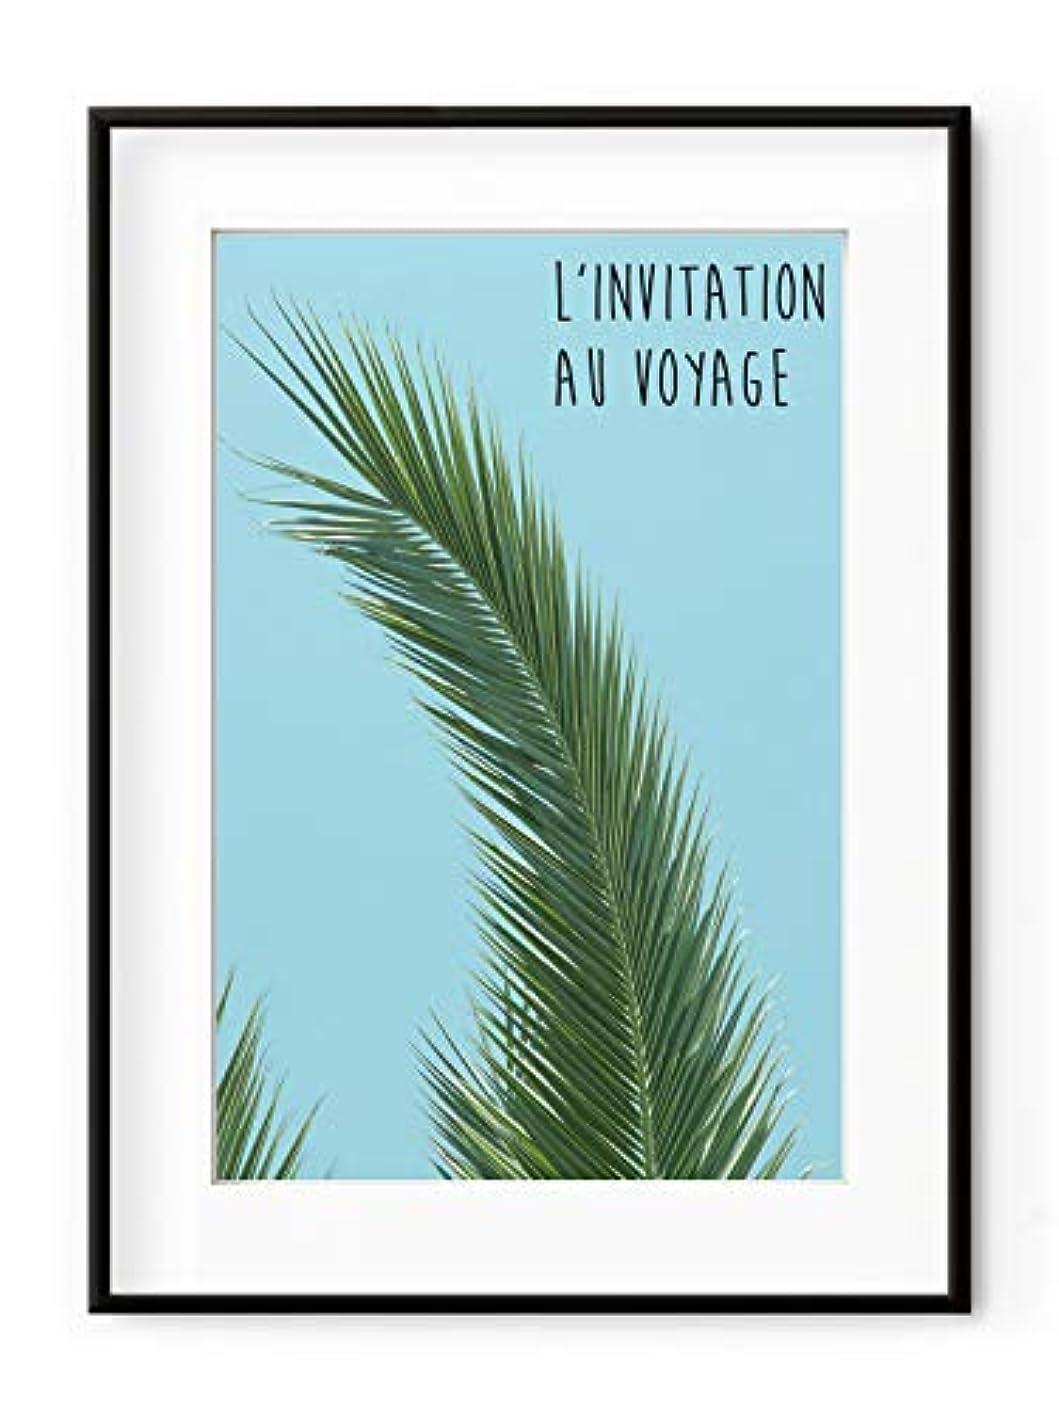 Invitation to Travel, Black Satin Aluminium Frame, with Mount, Multicolored, 70x100